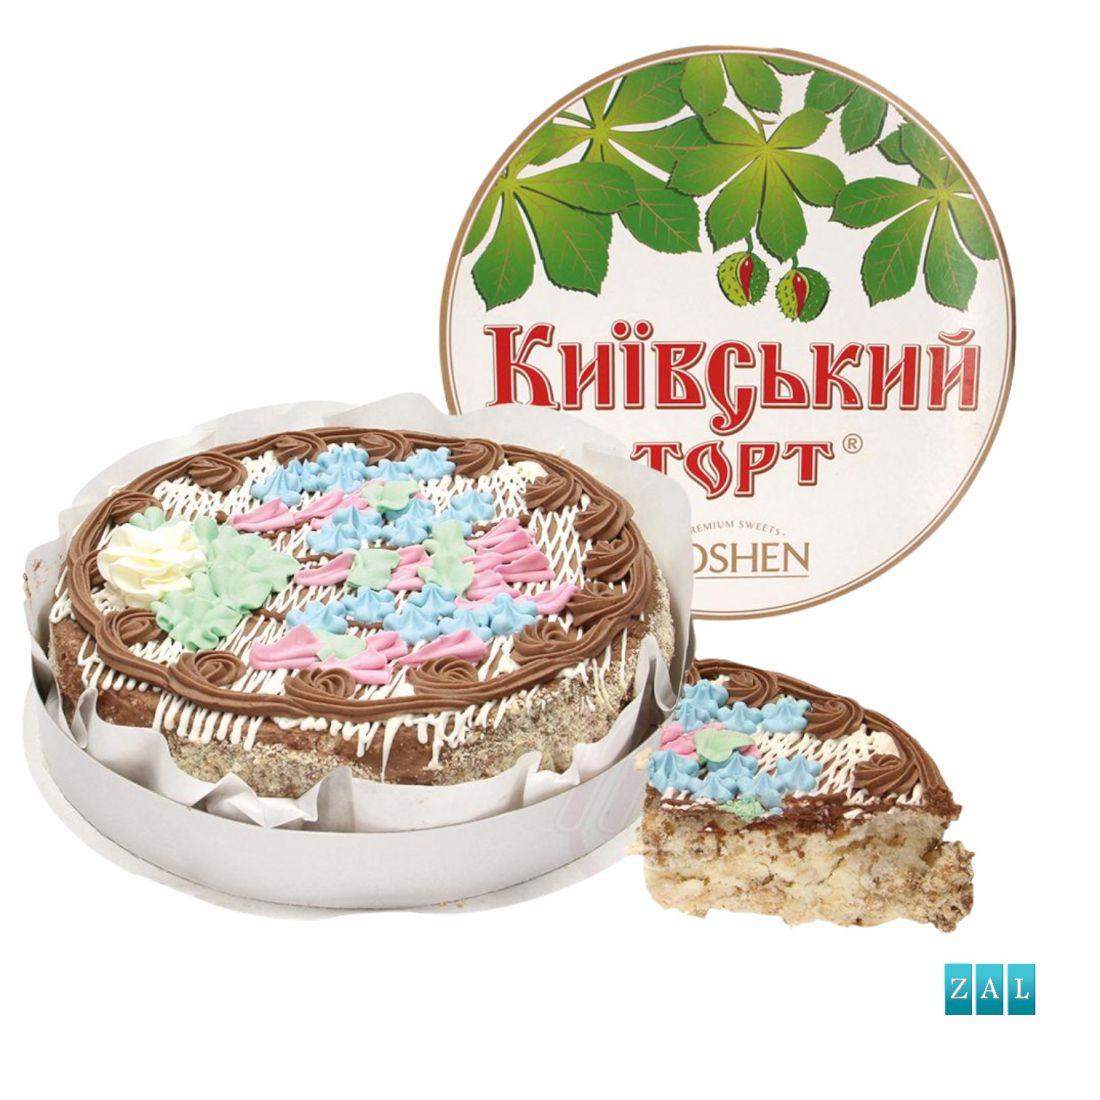 """Kijevi"" torta, fagyasztott ROSHEN 450g"